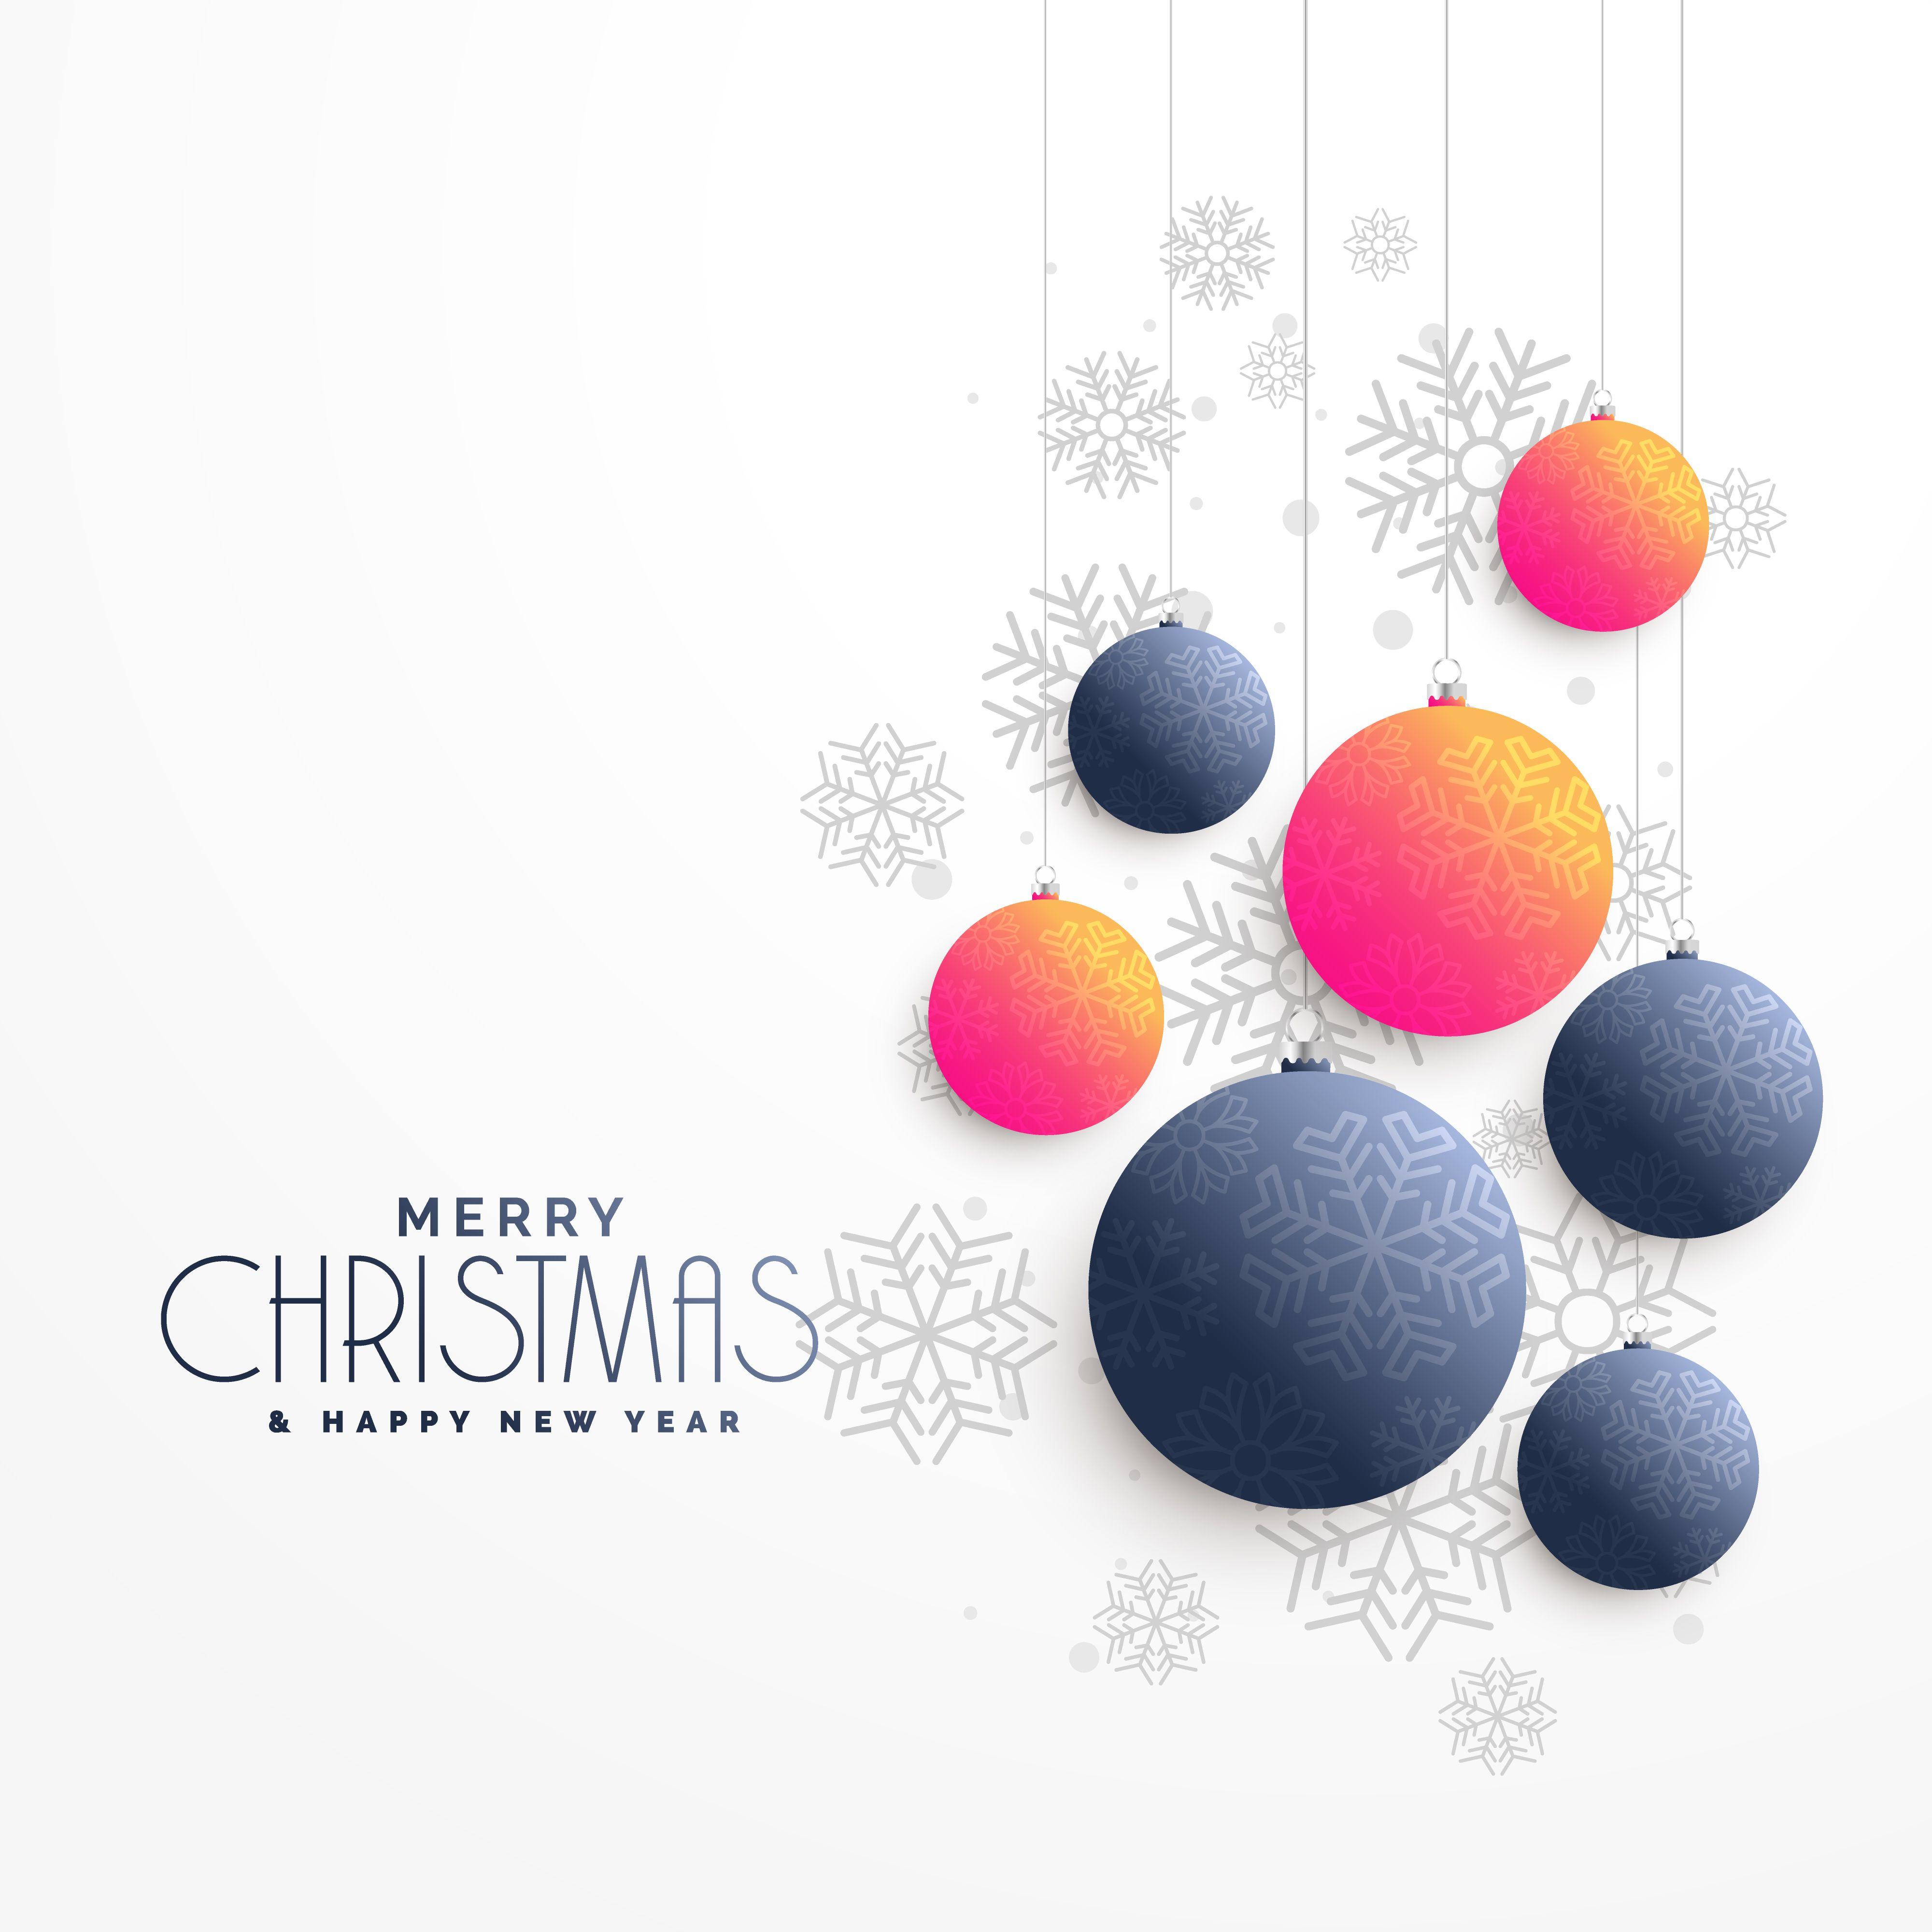 6026b0b8ce373 merry christmas beautigul greeting design with balls